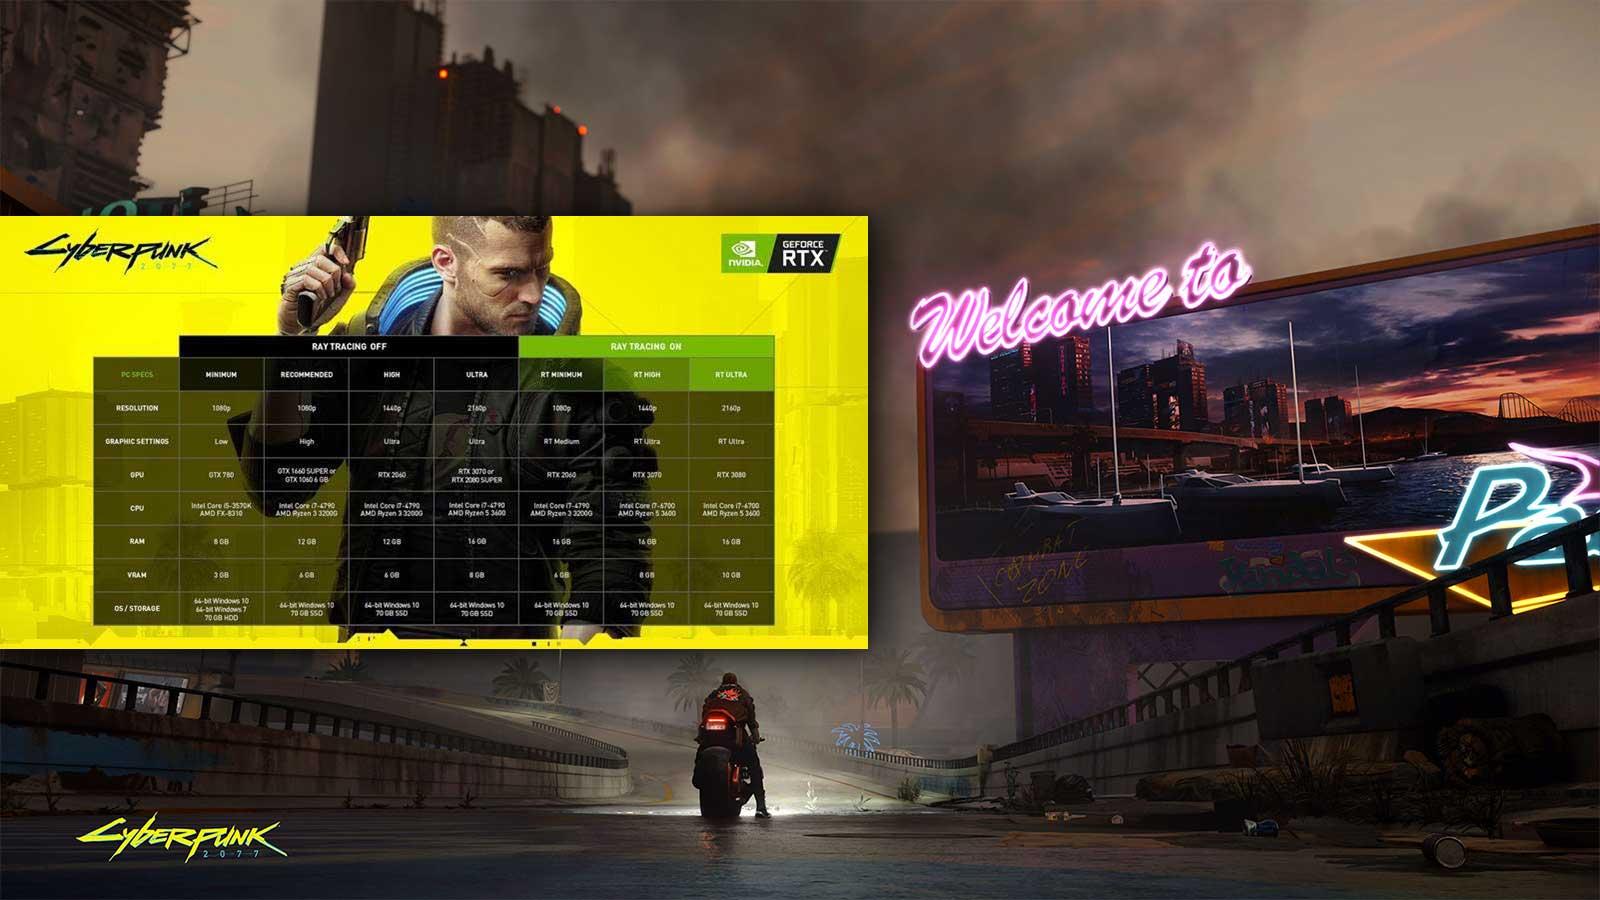 Cyberpunk2077 Welcome to Paradise RGB en babt